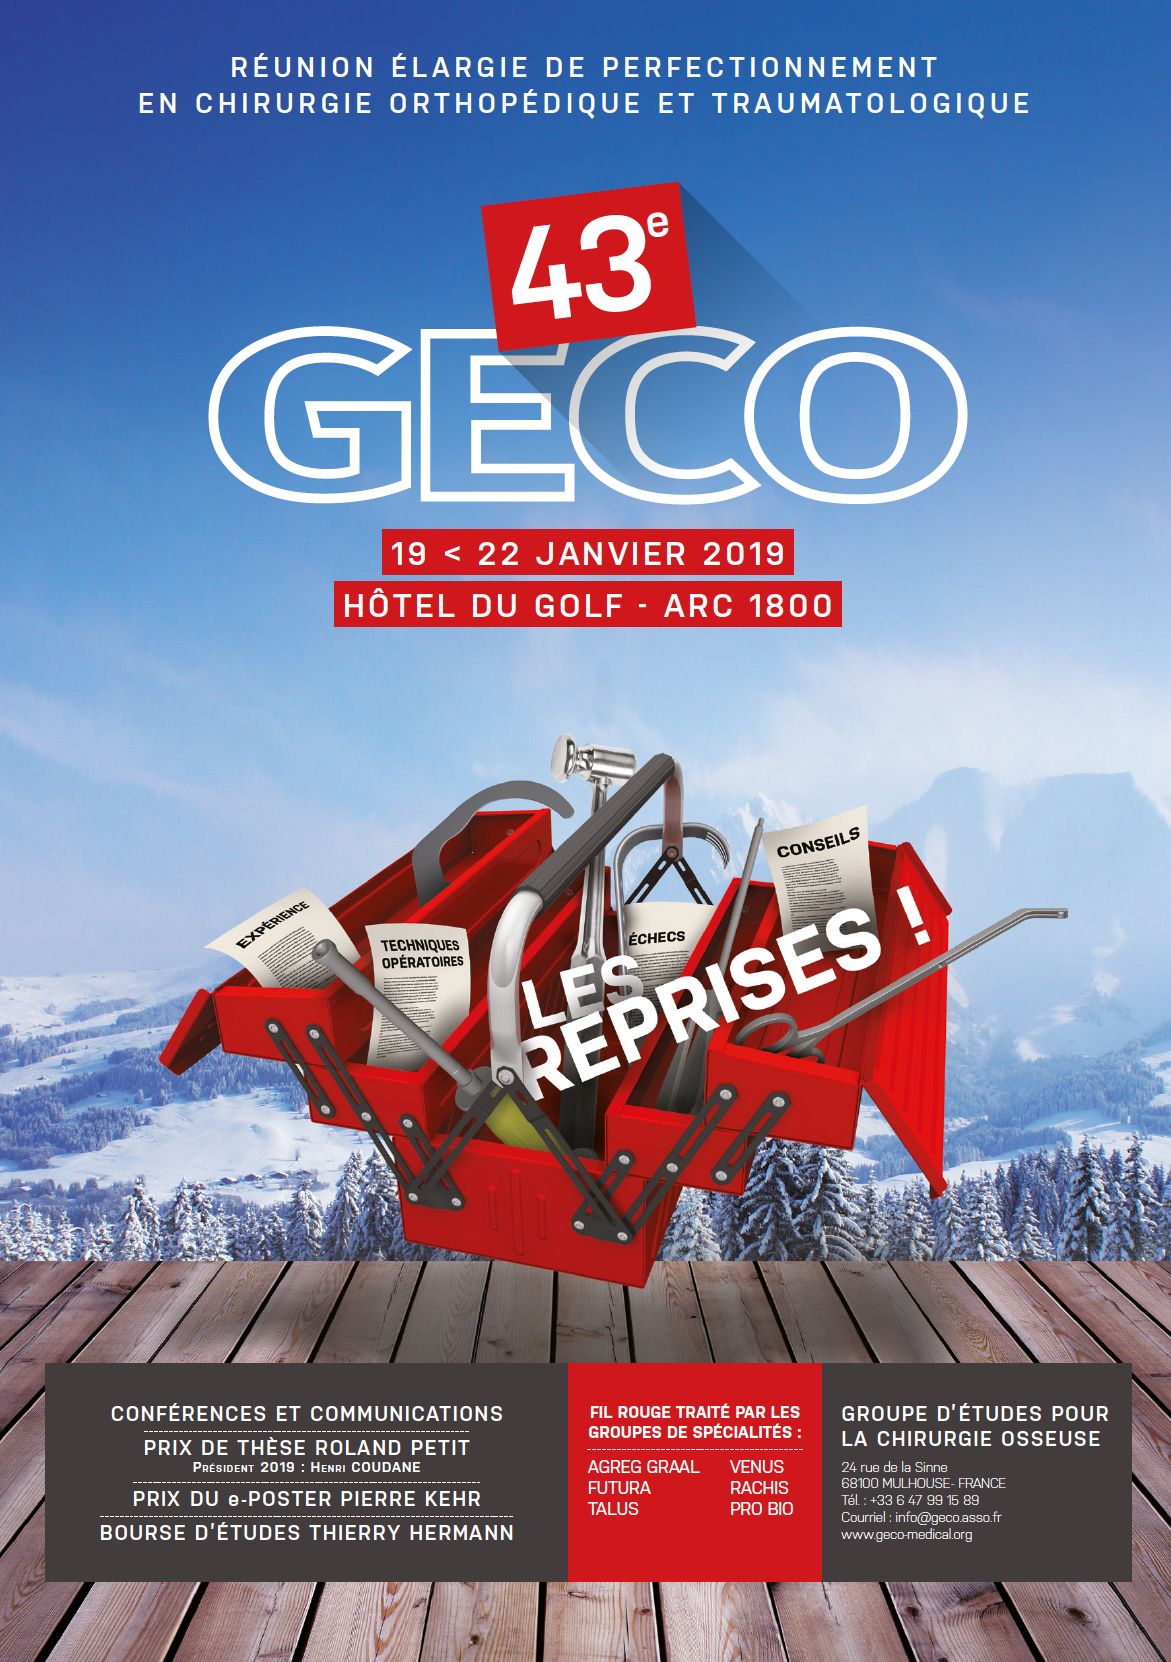 GECO 2019 affiche